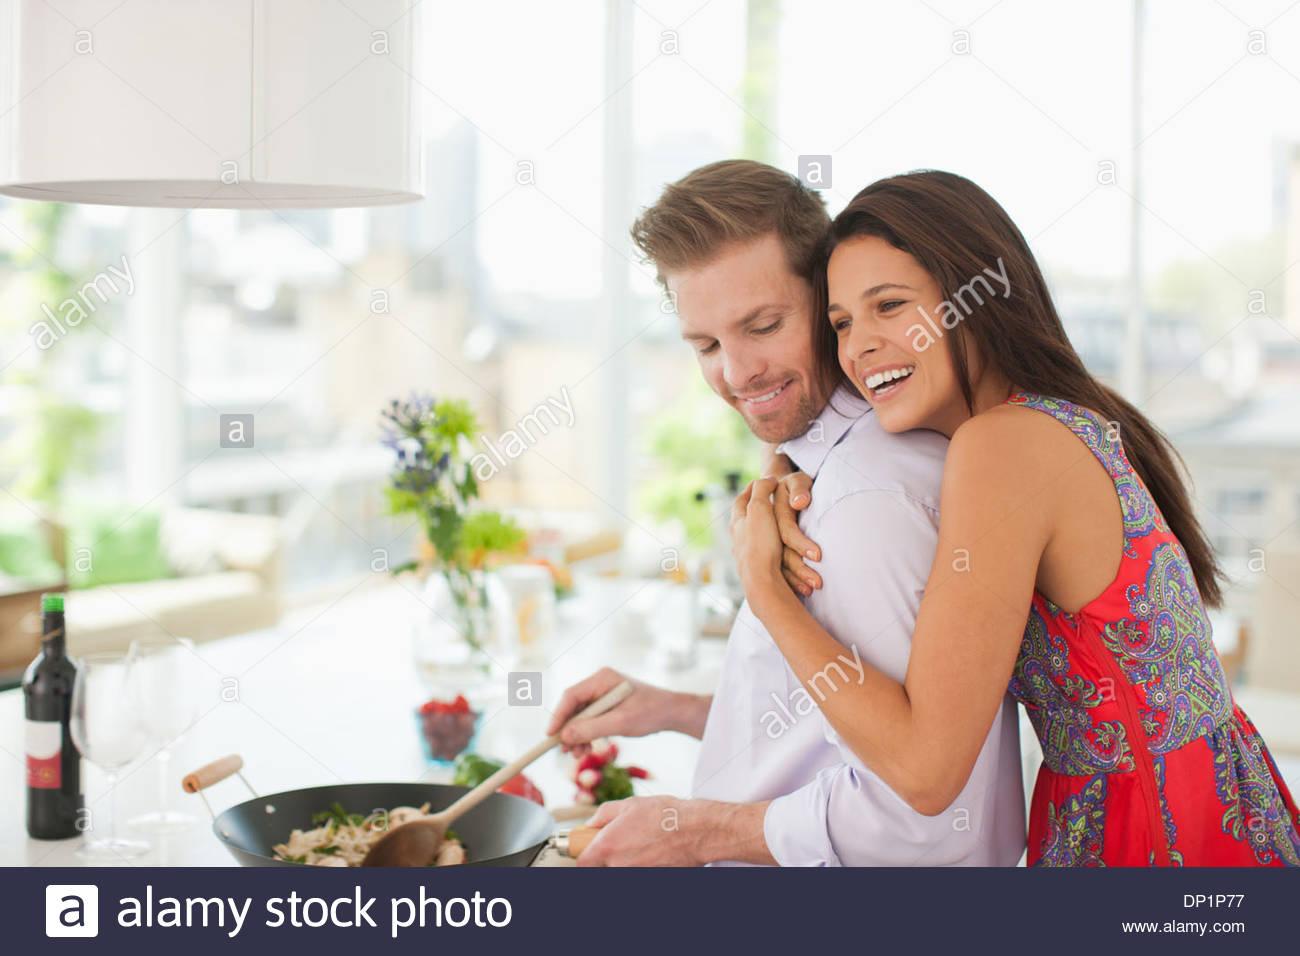 Woman hugging mari alors qu'il dans la cuisine la cuisine Photo Stock